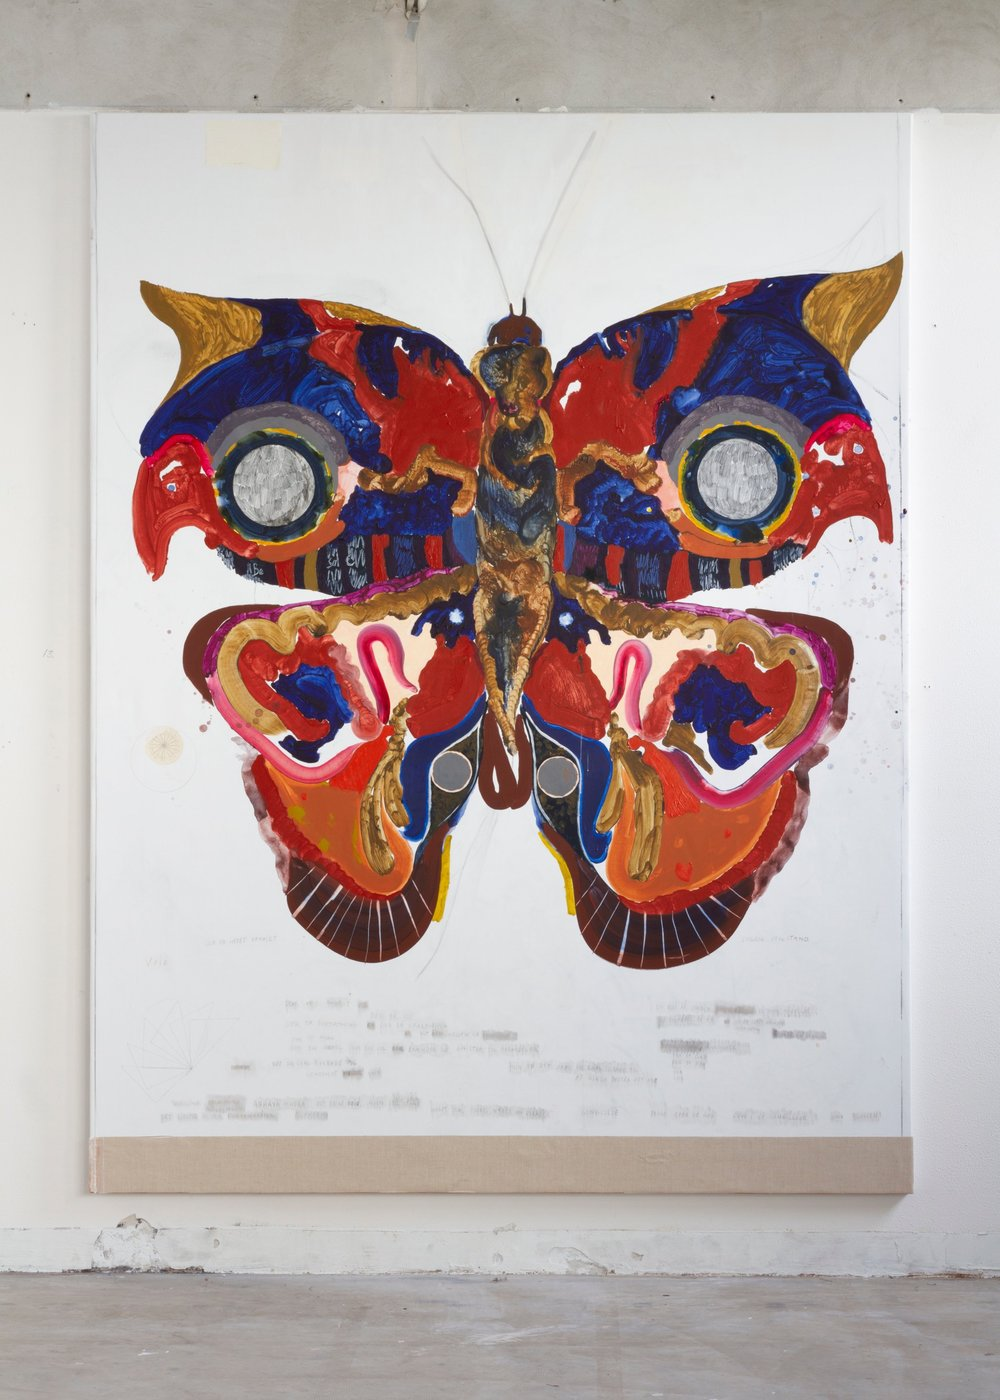 Skitse til forvandling / akryl, kul, papir og blyant på lærred, 250 x 190 cm